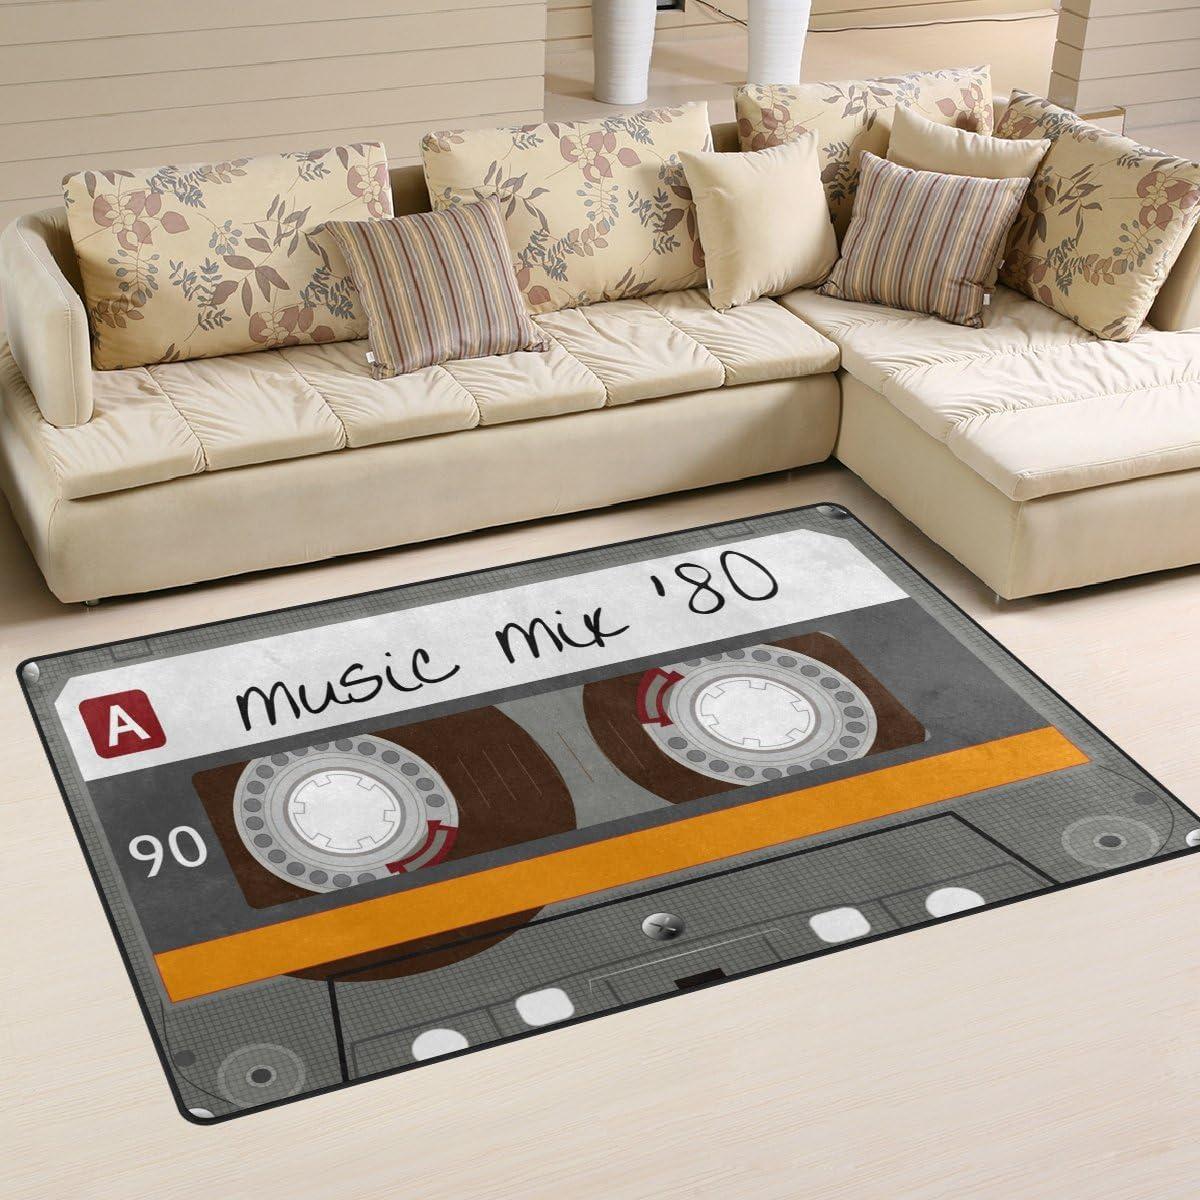 WOZO Vintage Cassette Tape Music Area Rug Rugs Non-Slip Floor Mat Doormats for Living Room Bedroom 60 x 39 inches